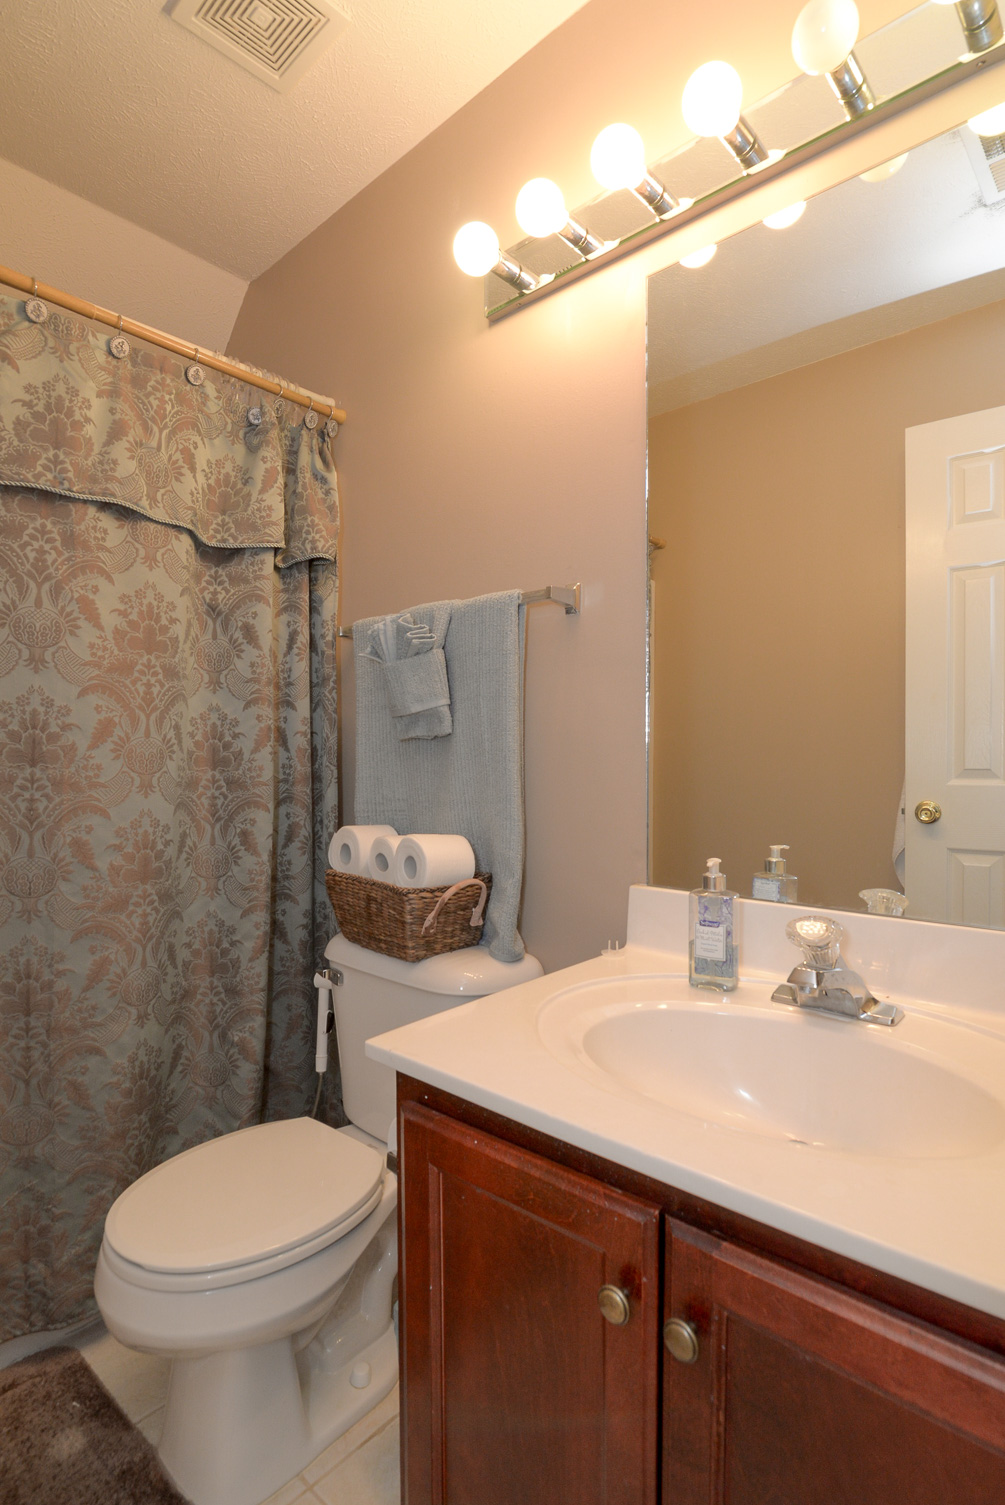 Bathroom Sinks Nashville Tn houselens | properties.houselens/teamkipp~sharon&davidkipp